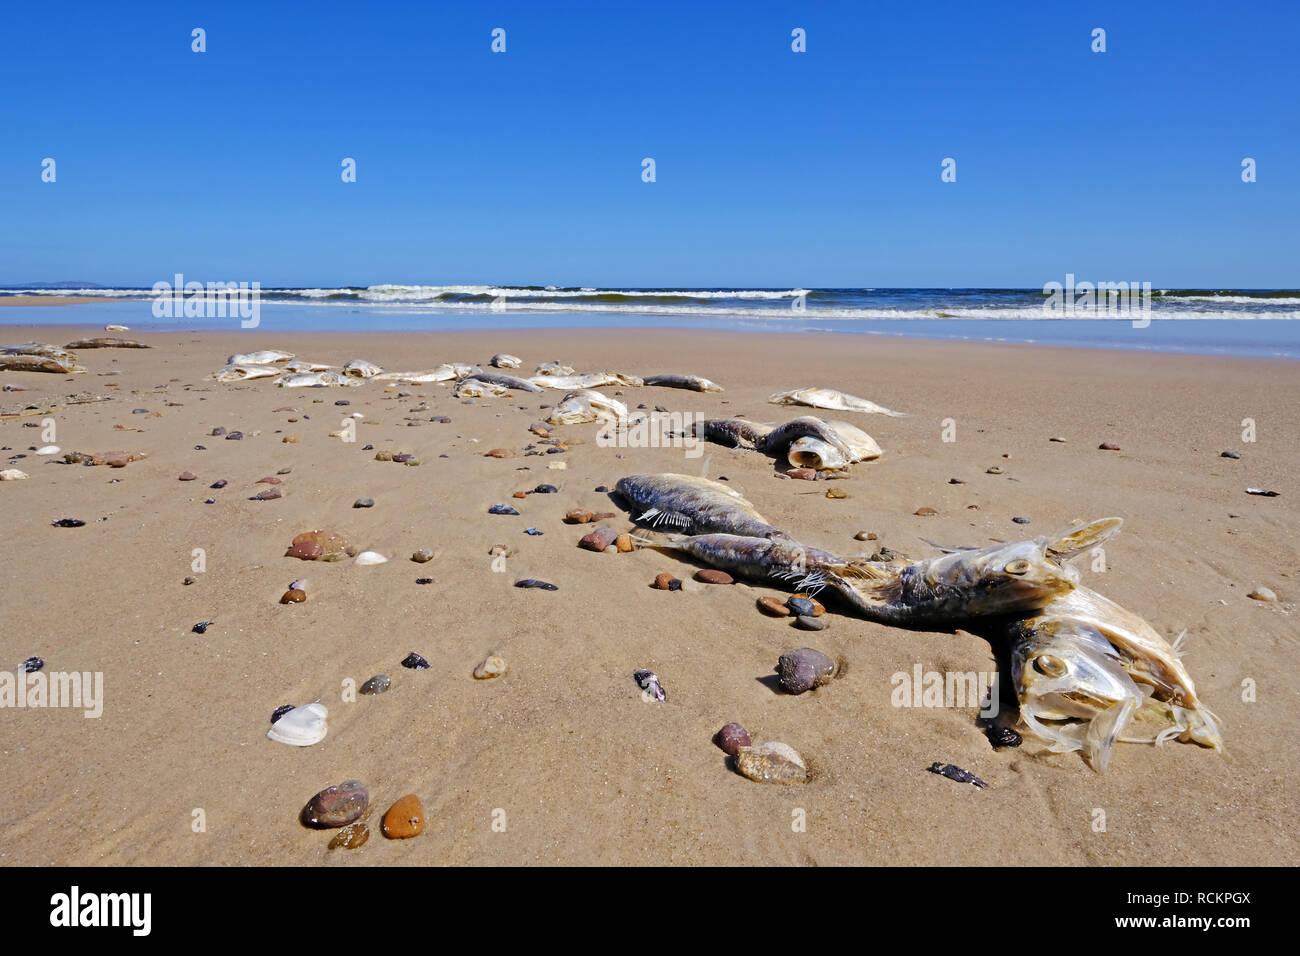 Dead fish on the beach, Uruguay, South America - Stock Image